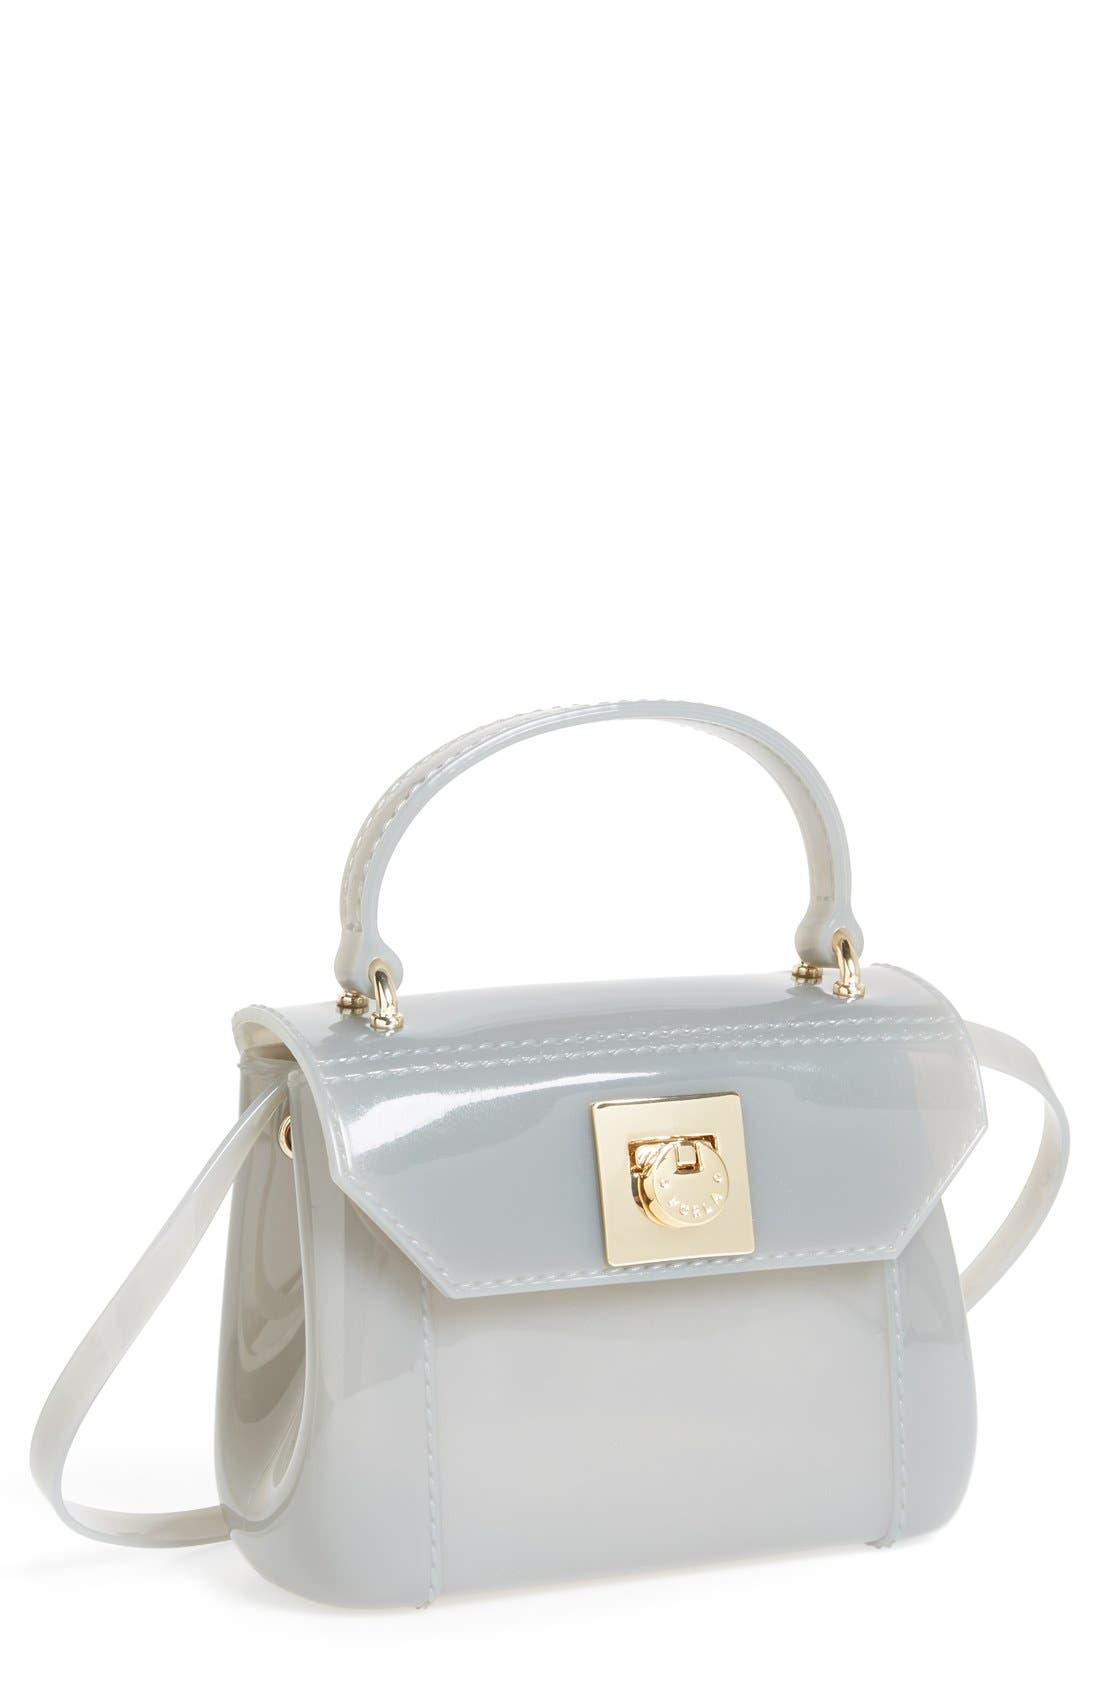 'Candy - Mini' Top Handle Crossbody Bag,                             Main thumbnail 1, color,                             020